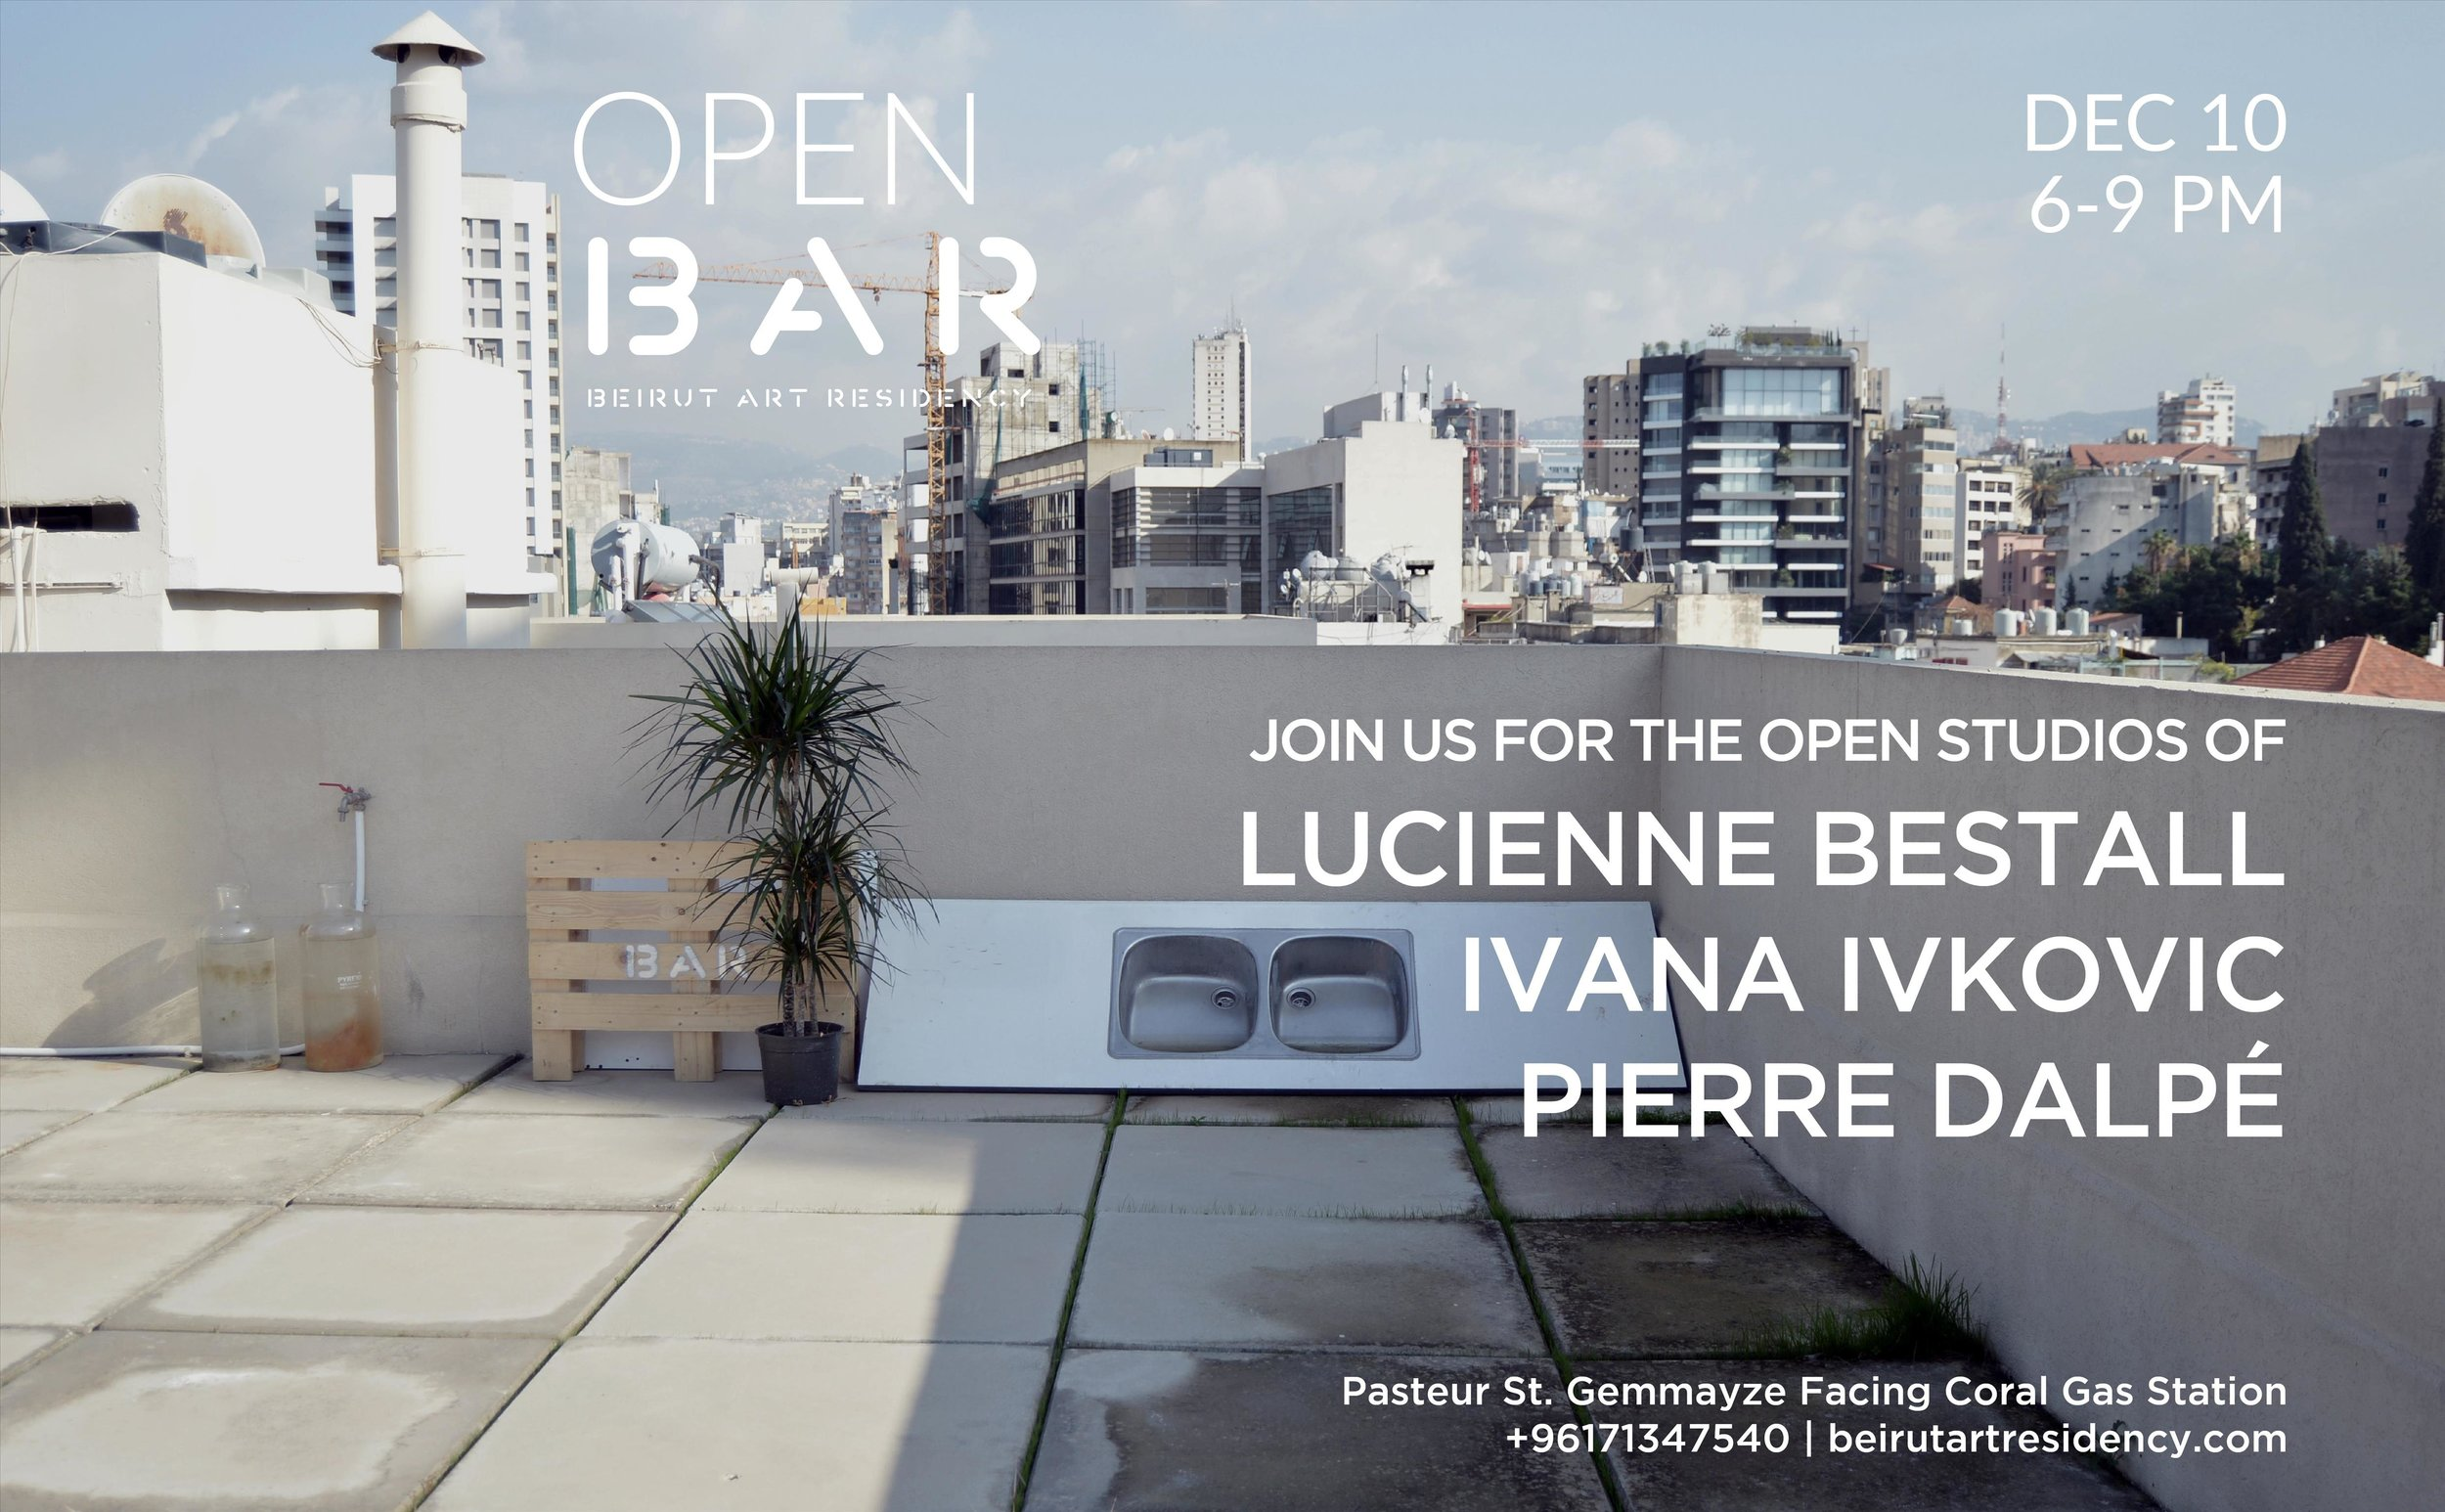 Open Studios Invitation.jpg